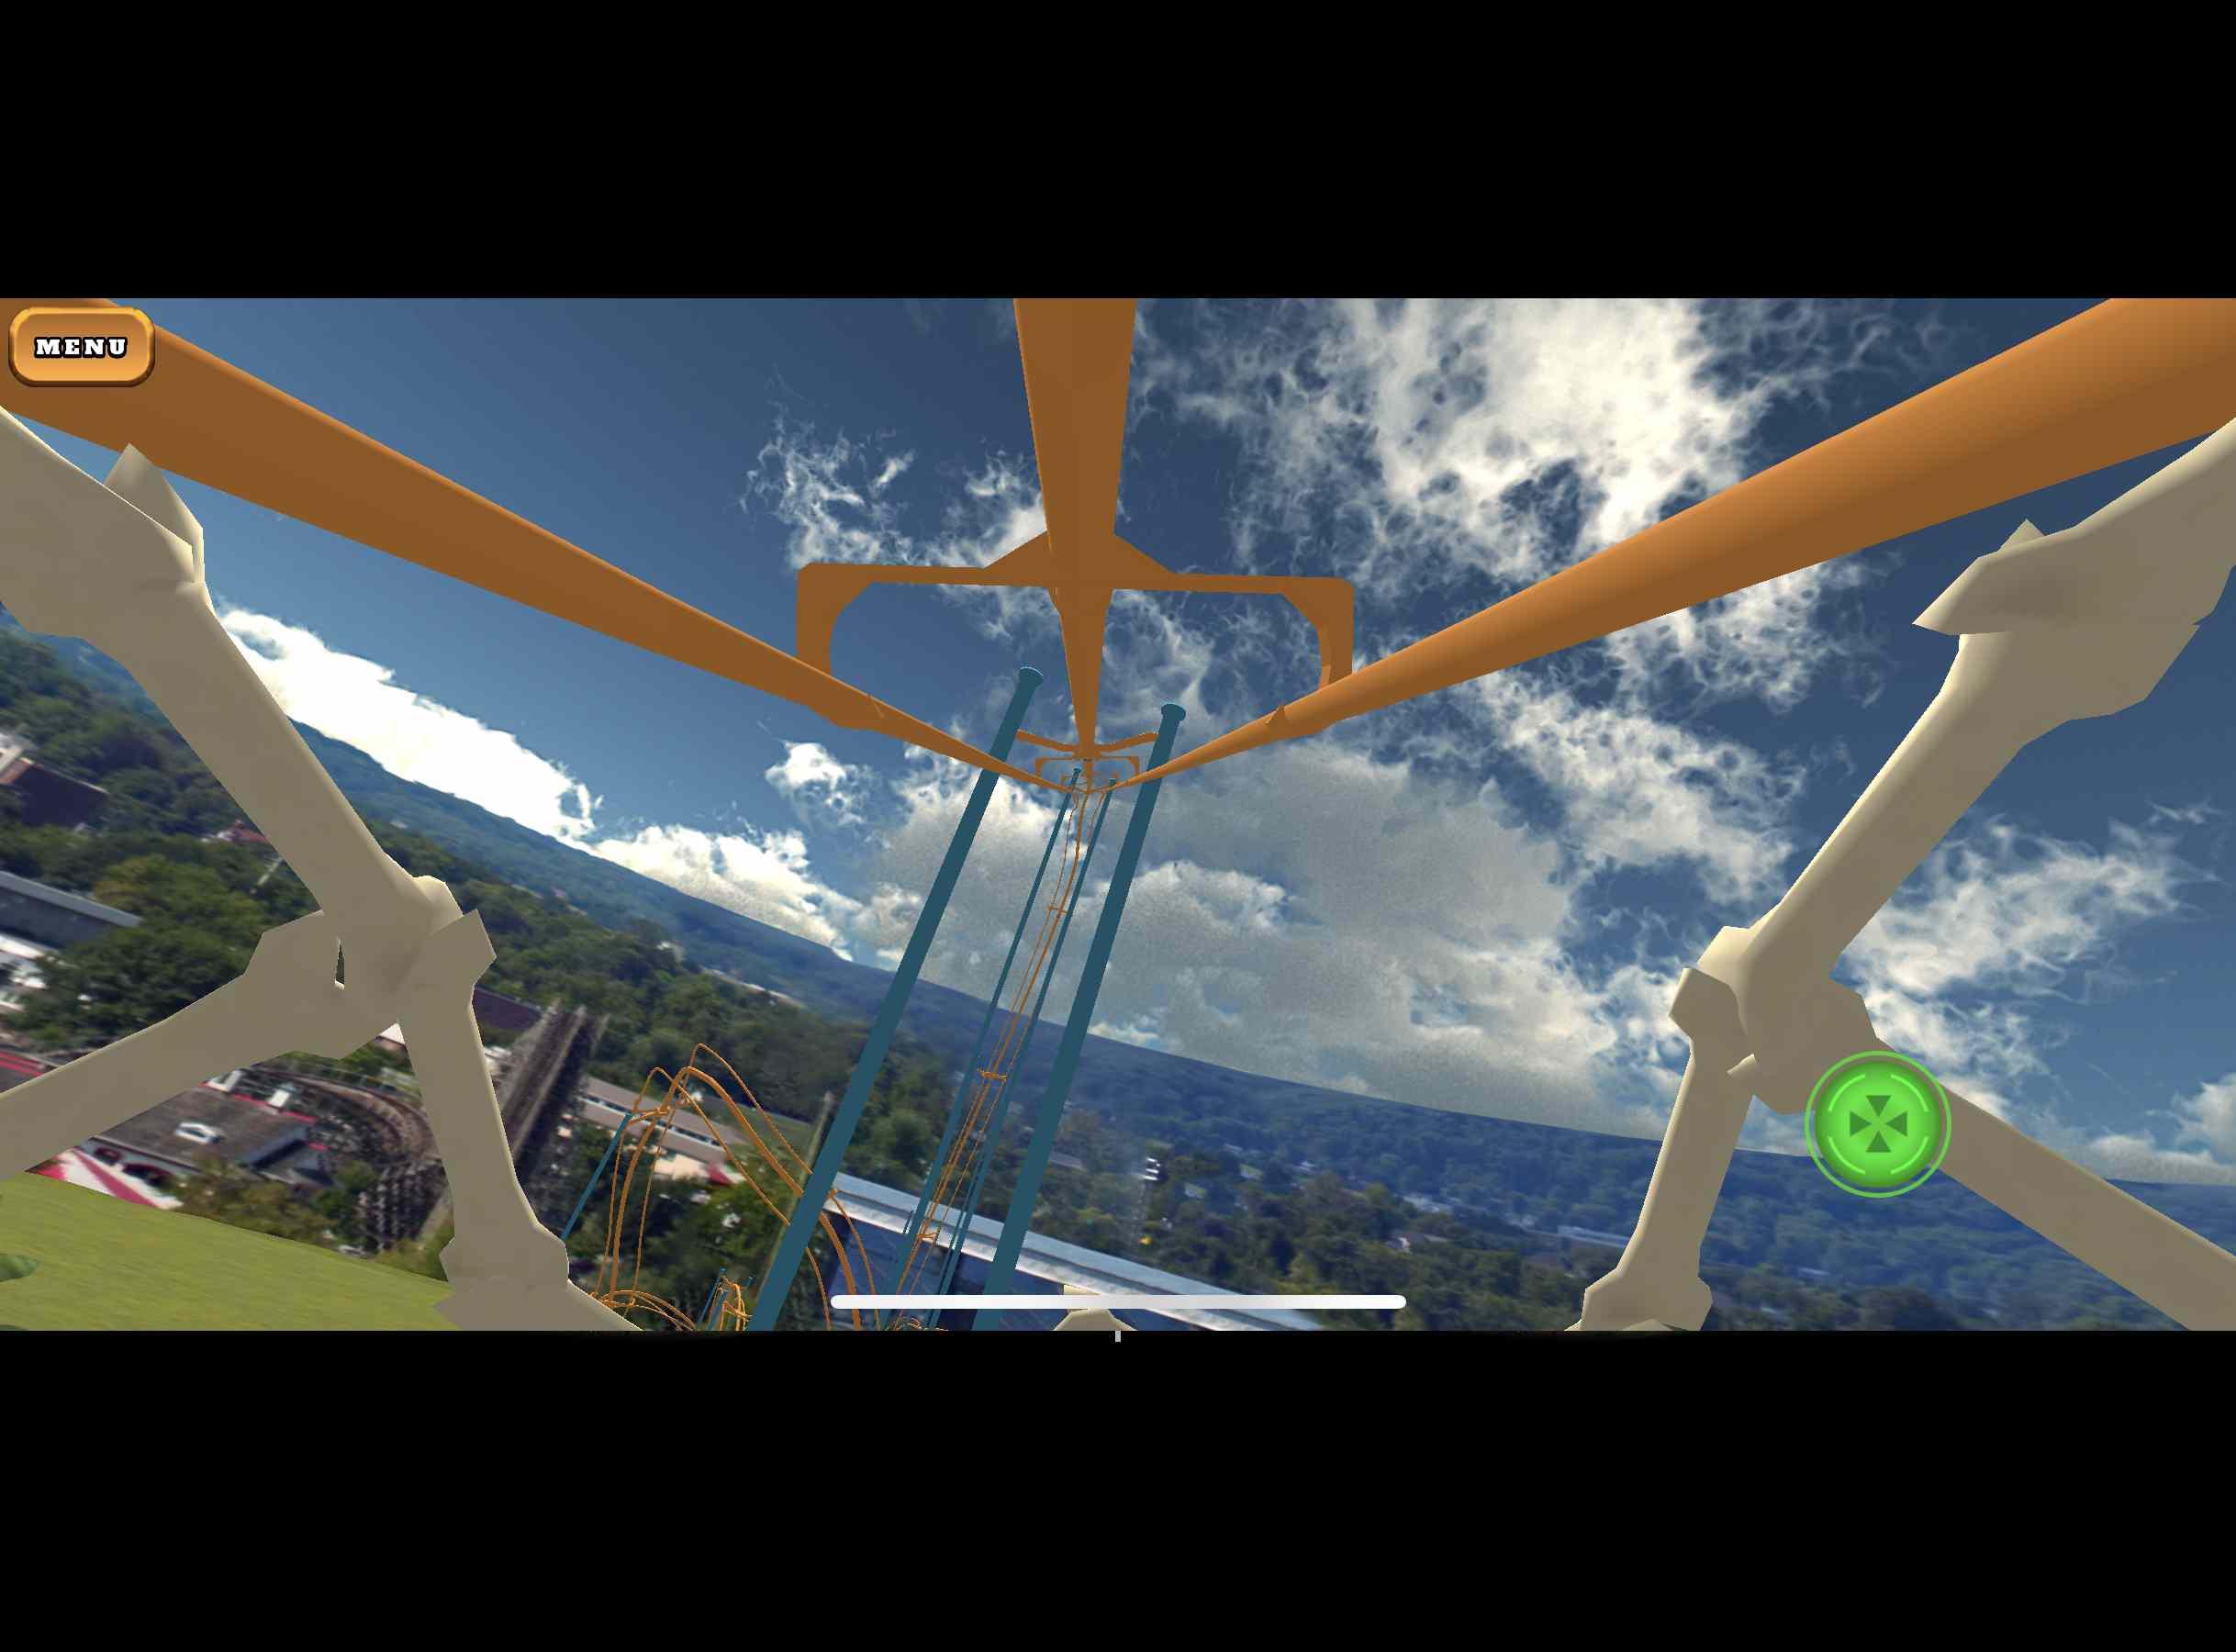 Roller Coaster VR Theme Park app on iPhone.